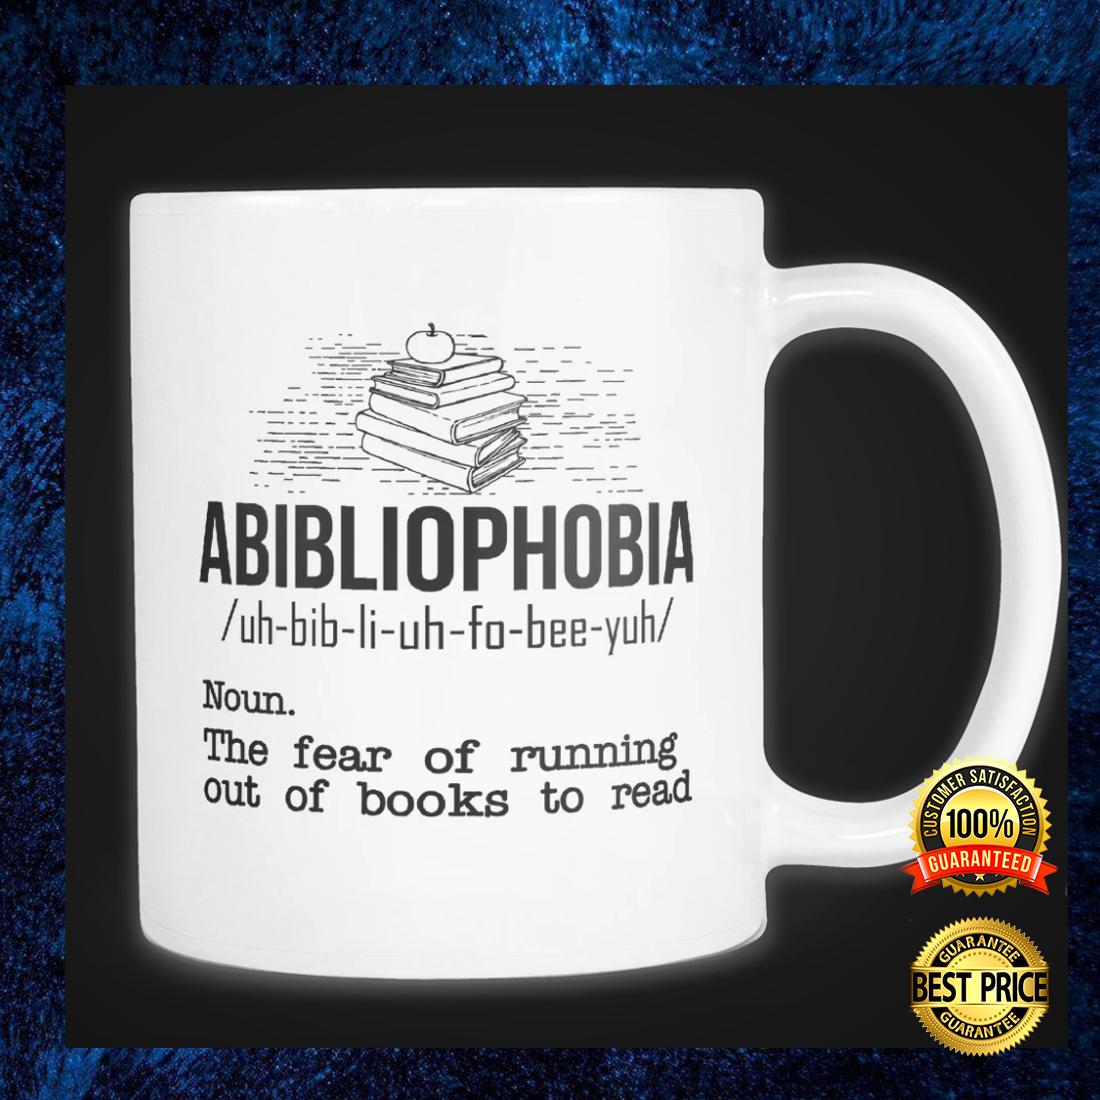 Abibliophobia definition mug 1